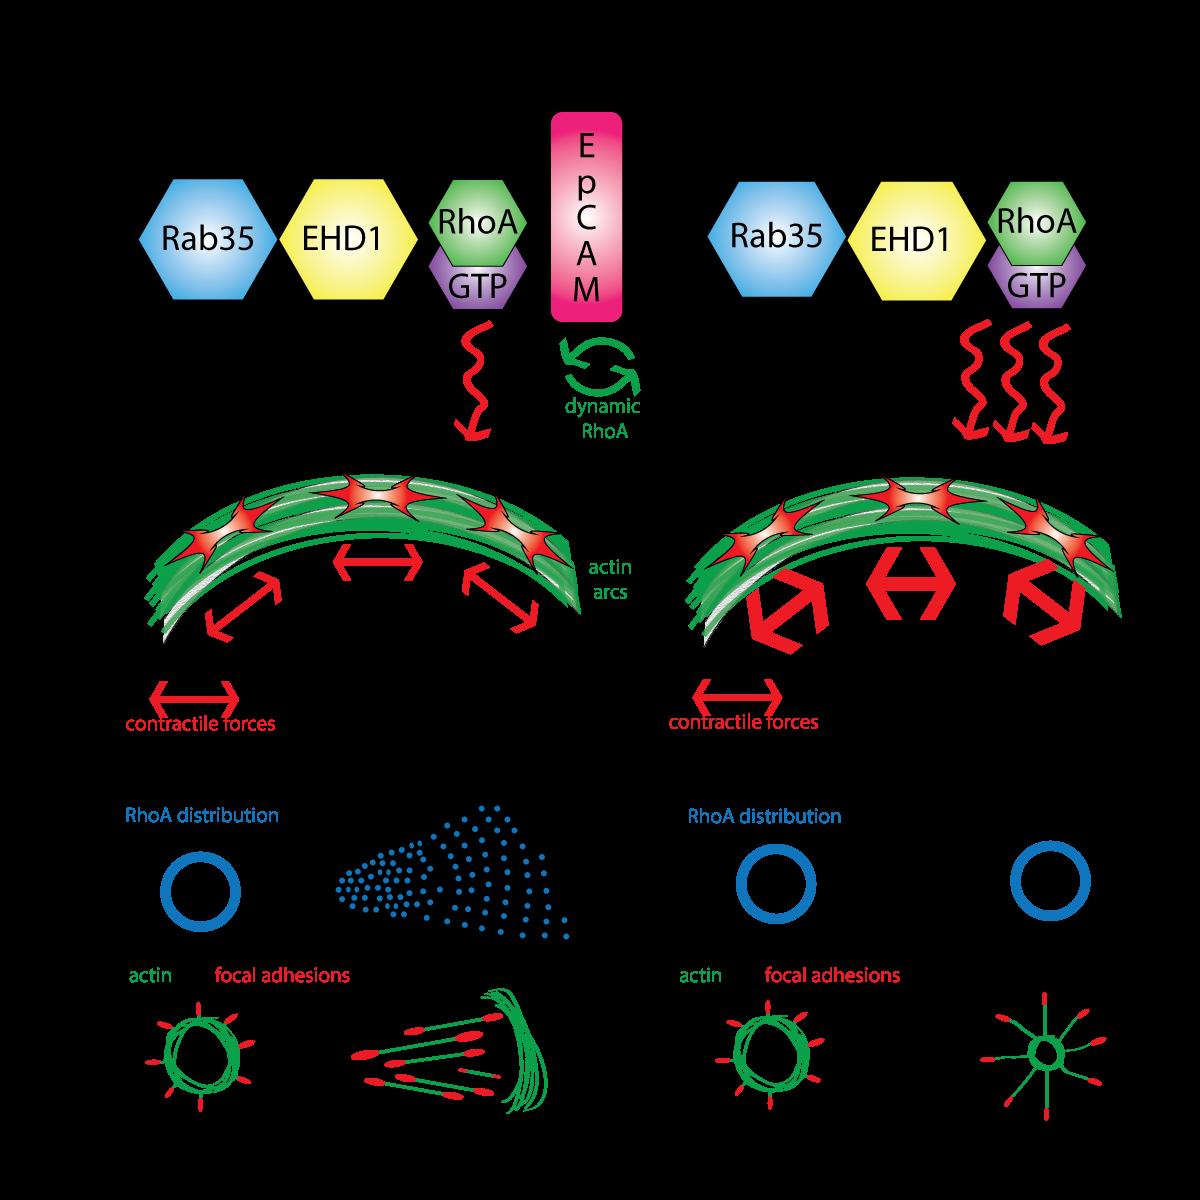 EpCAM_promotes_endosomal_modulation_of_the_cortical_RhoA